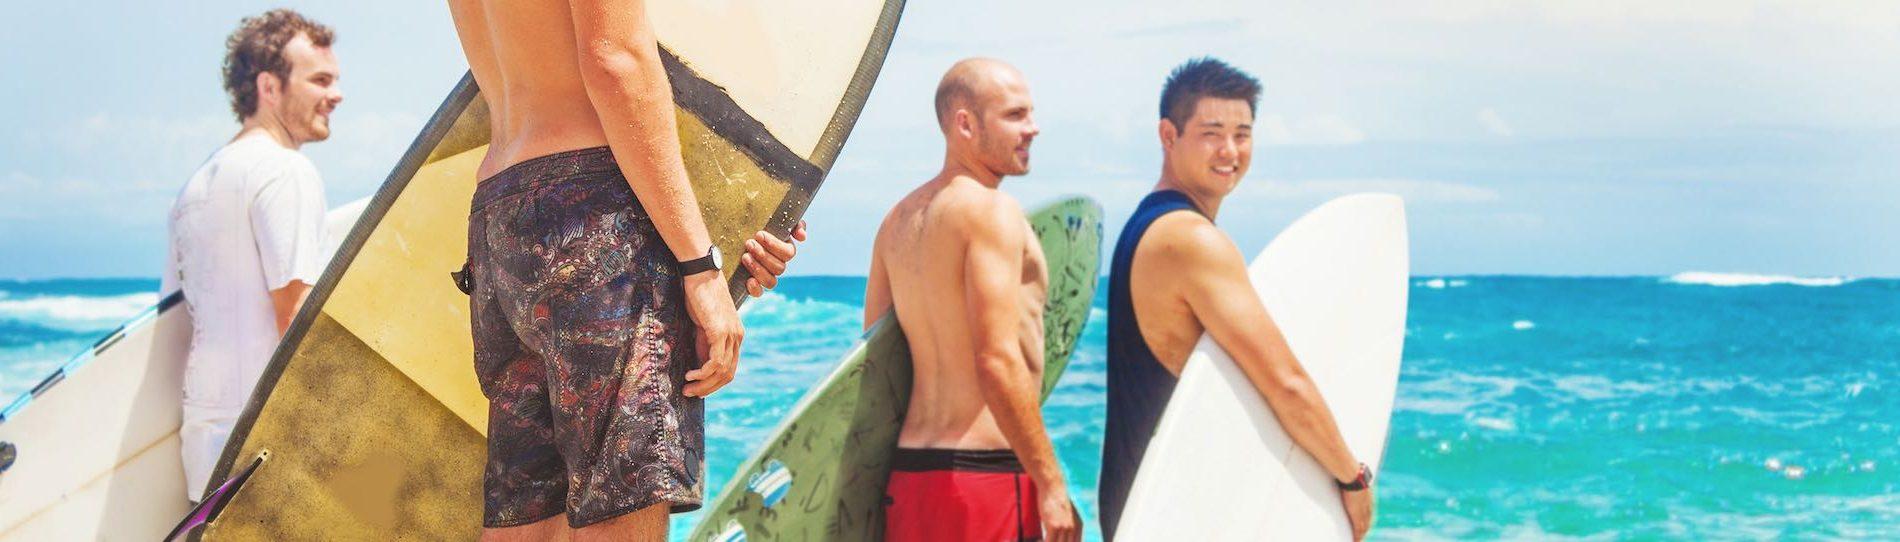 group of bucks surfing